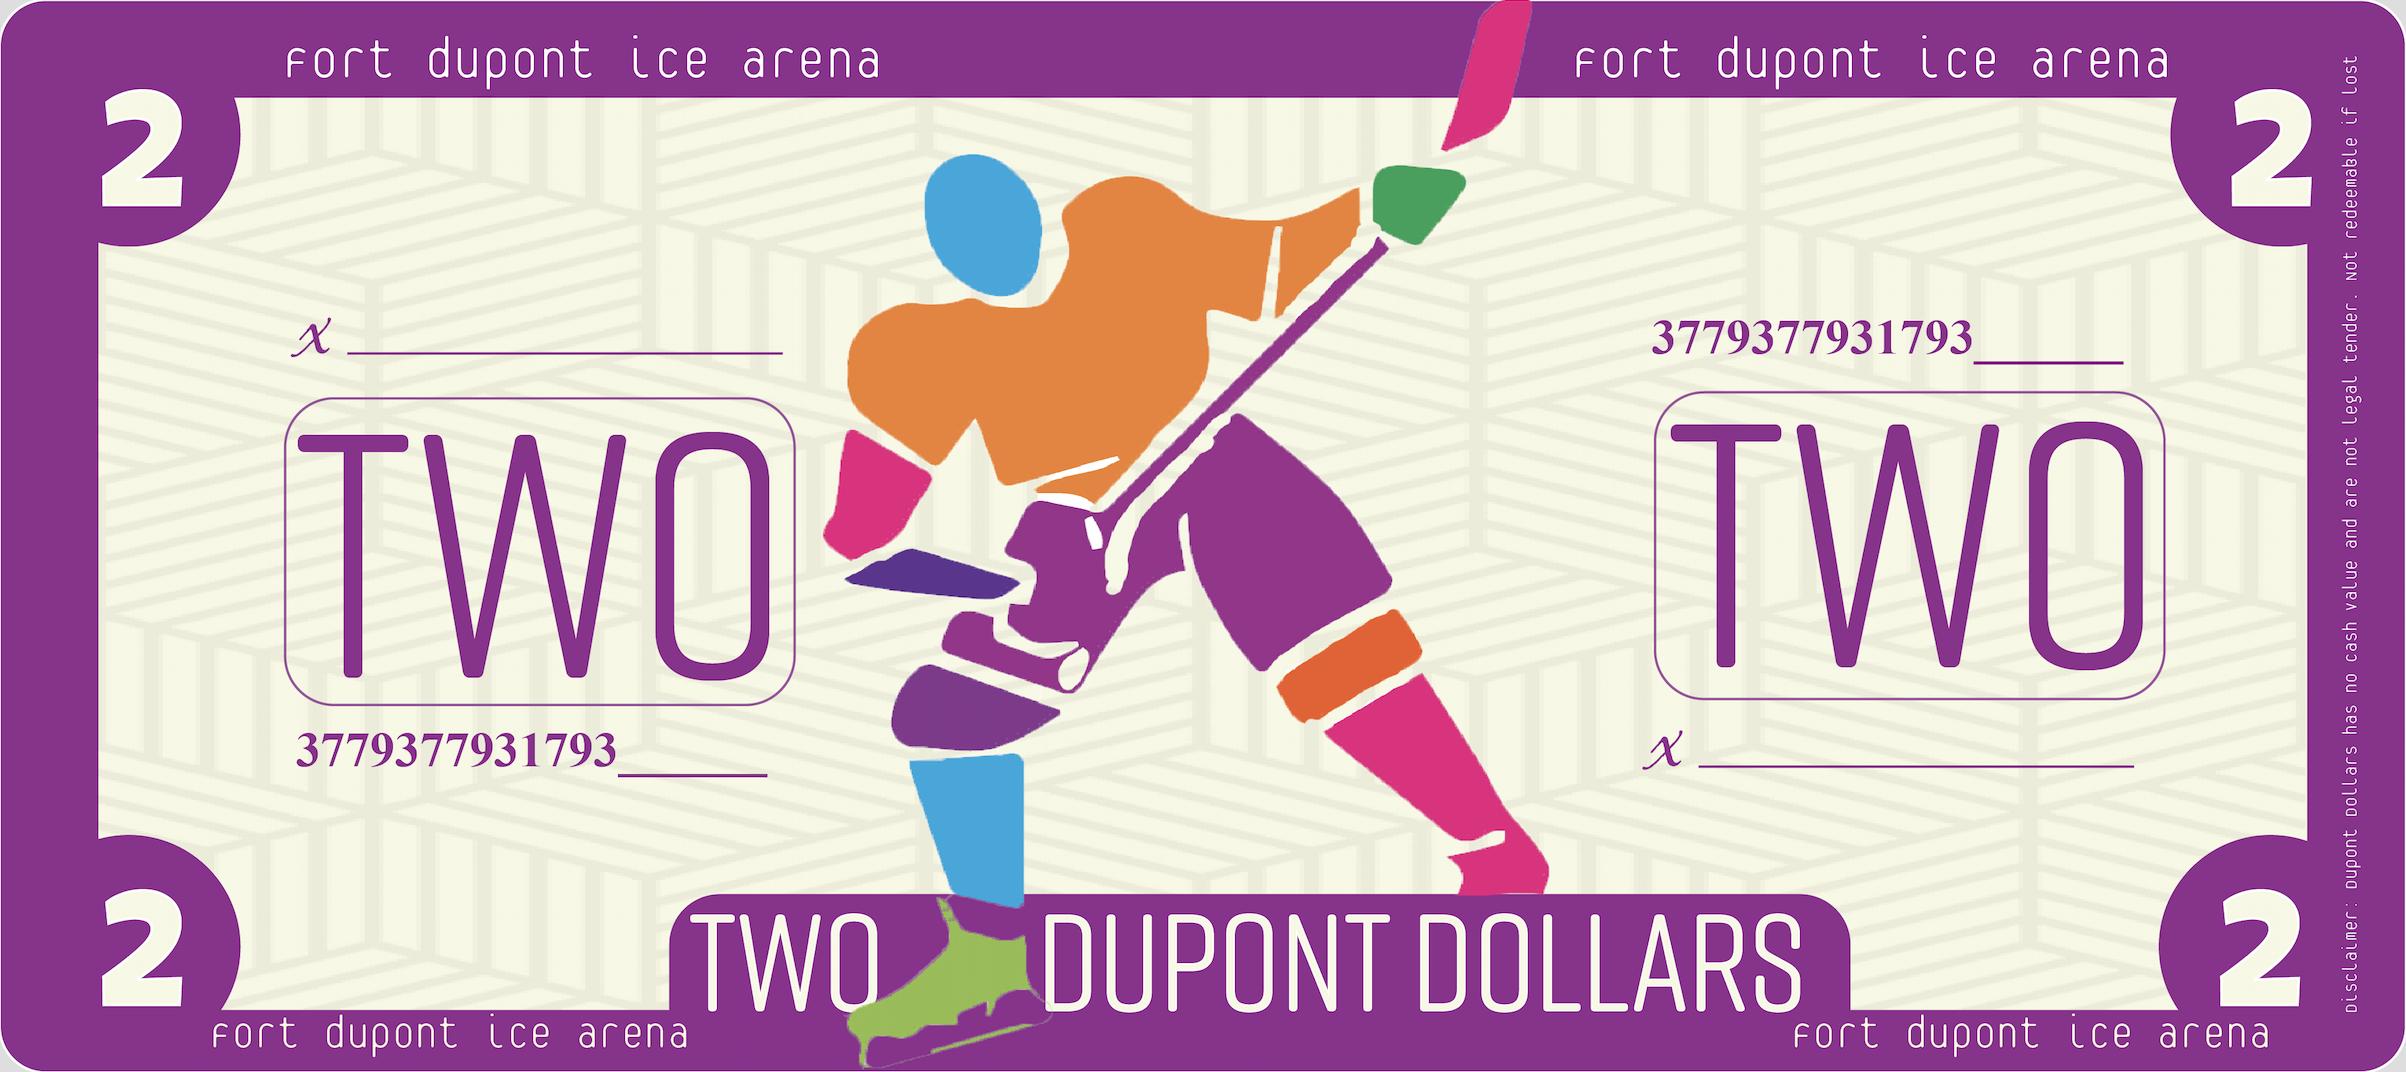 FDIA Dupont Dollars _ Two